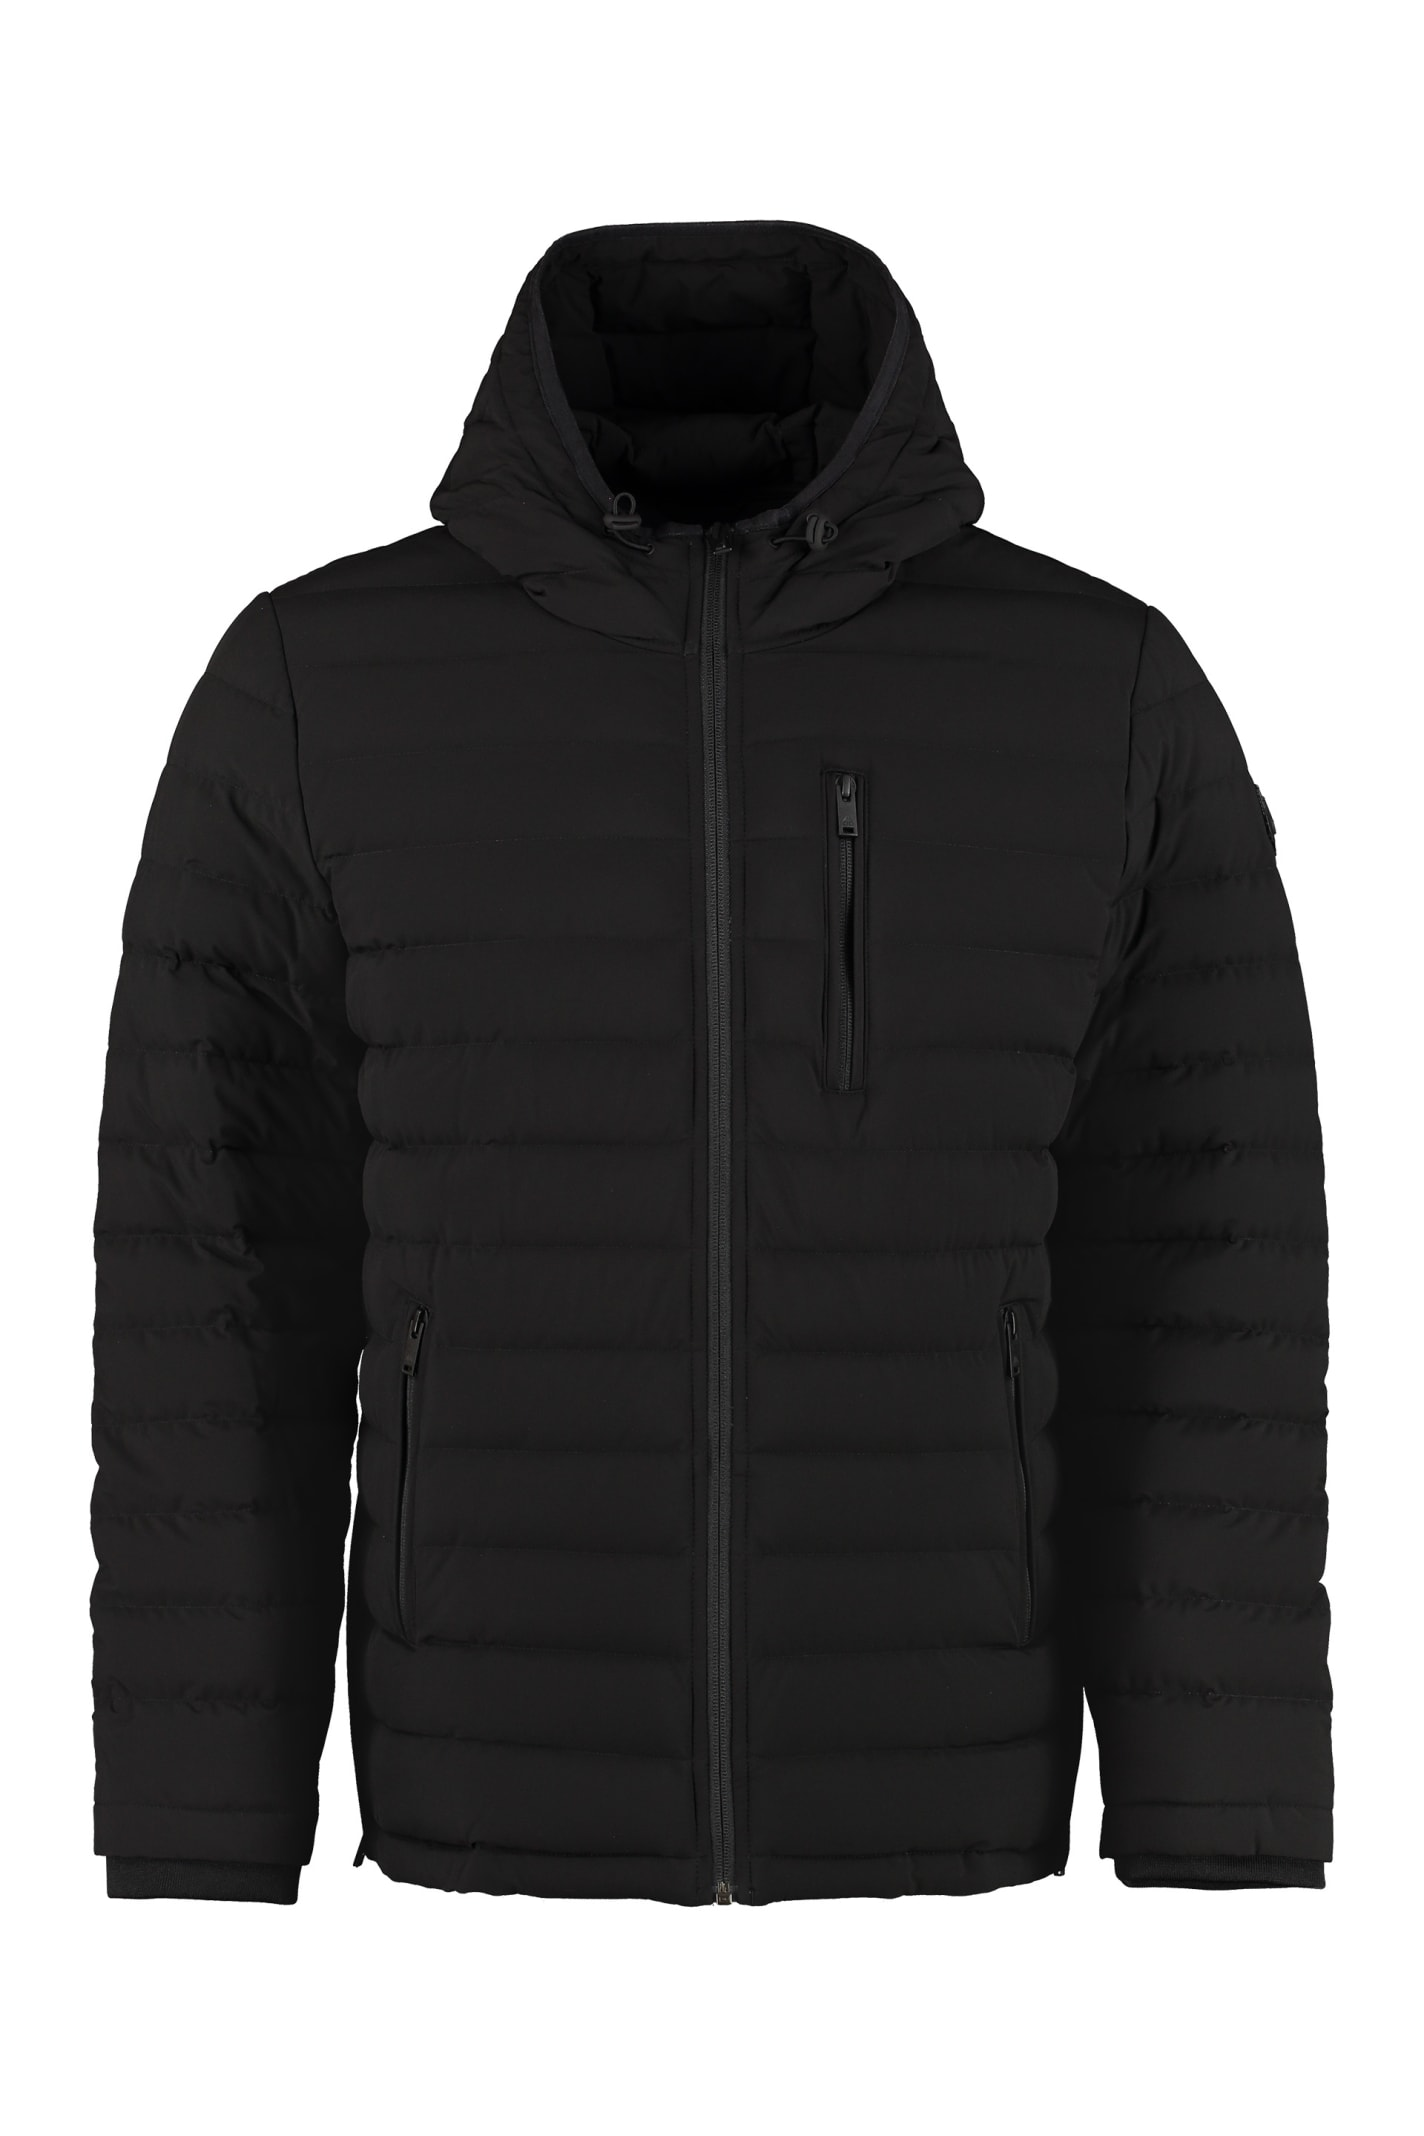 Best price on the market at italist | Moose Knuckles Moose Knuckles Fullcrest Hooded Down Jacket